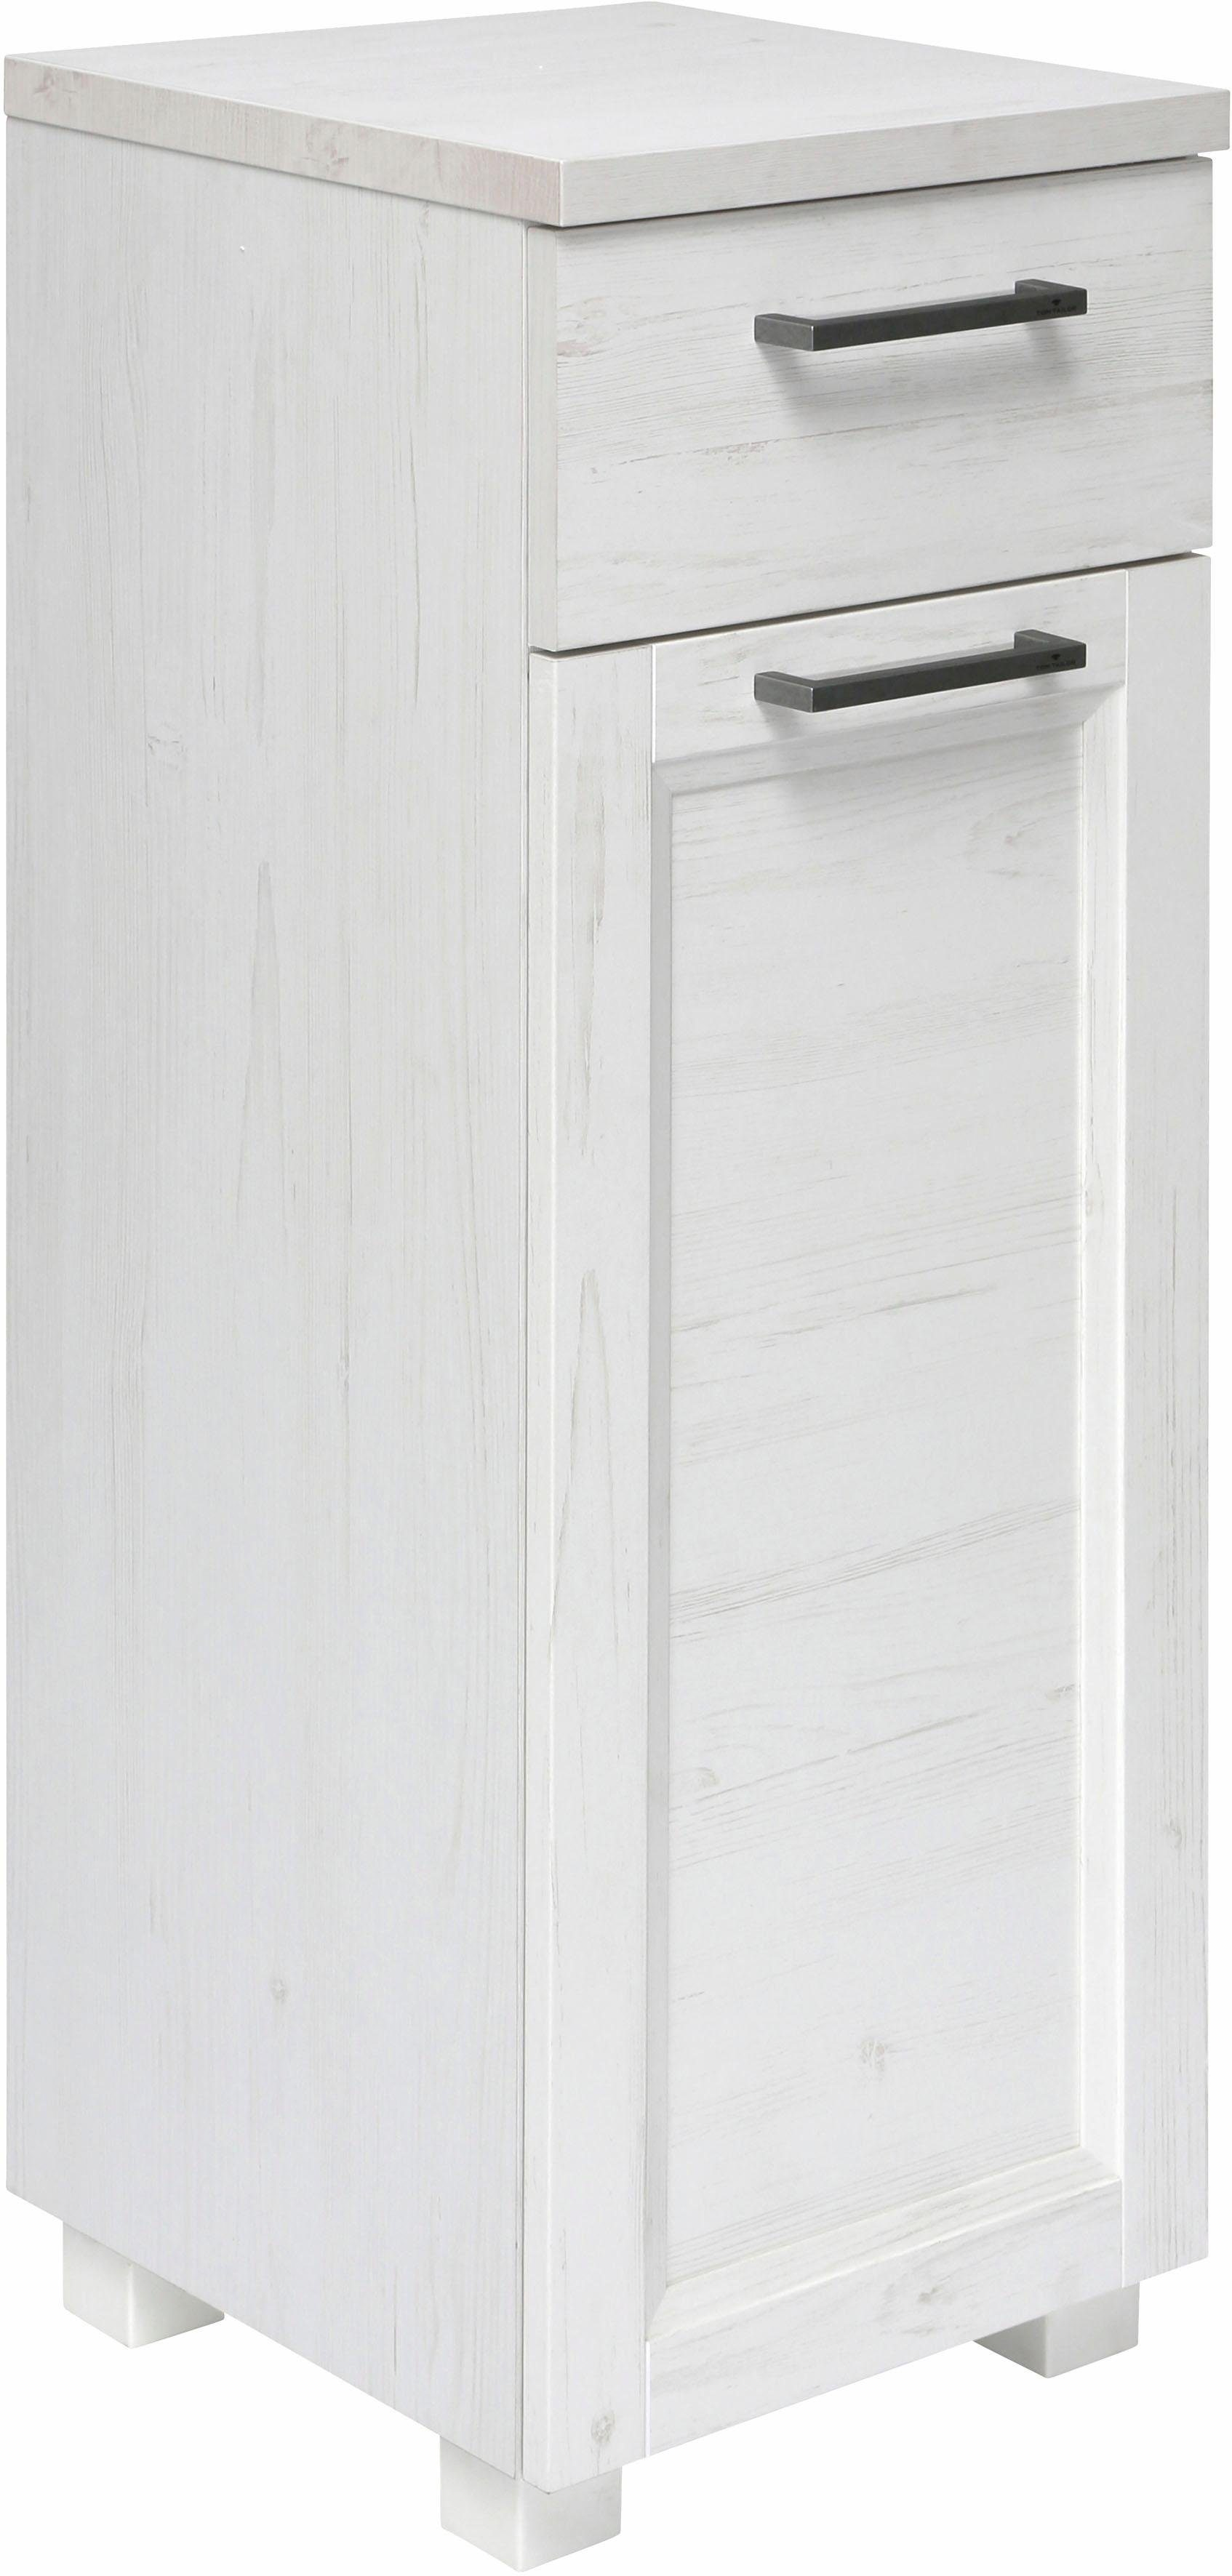 TOM TAILOR Unterschrank »HAMPTONS« 1-türig, mit Schublade, Höhe 93,8 cm